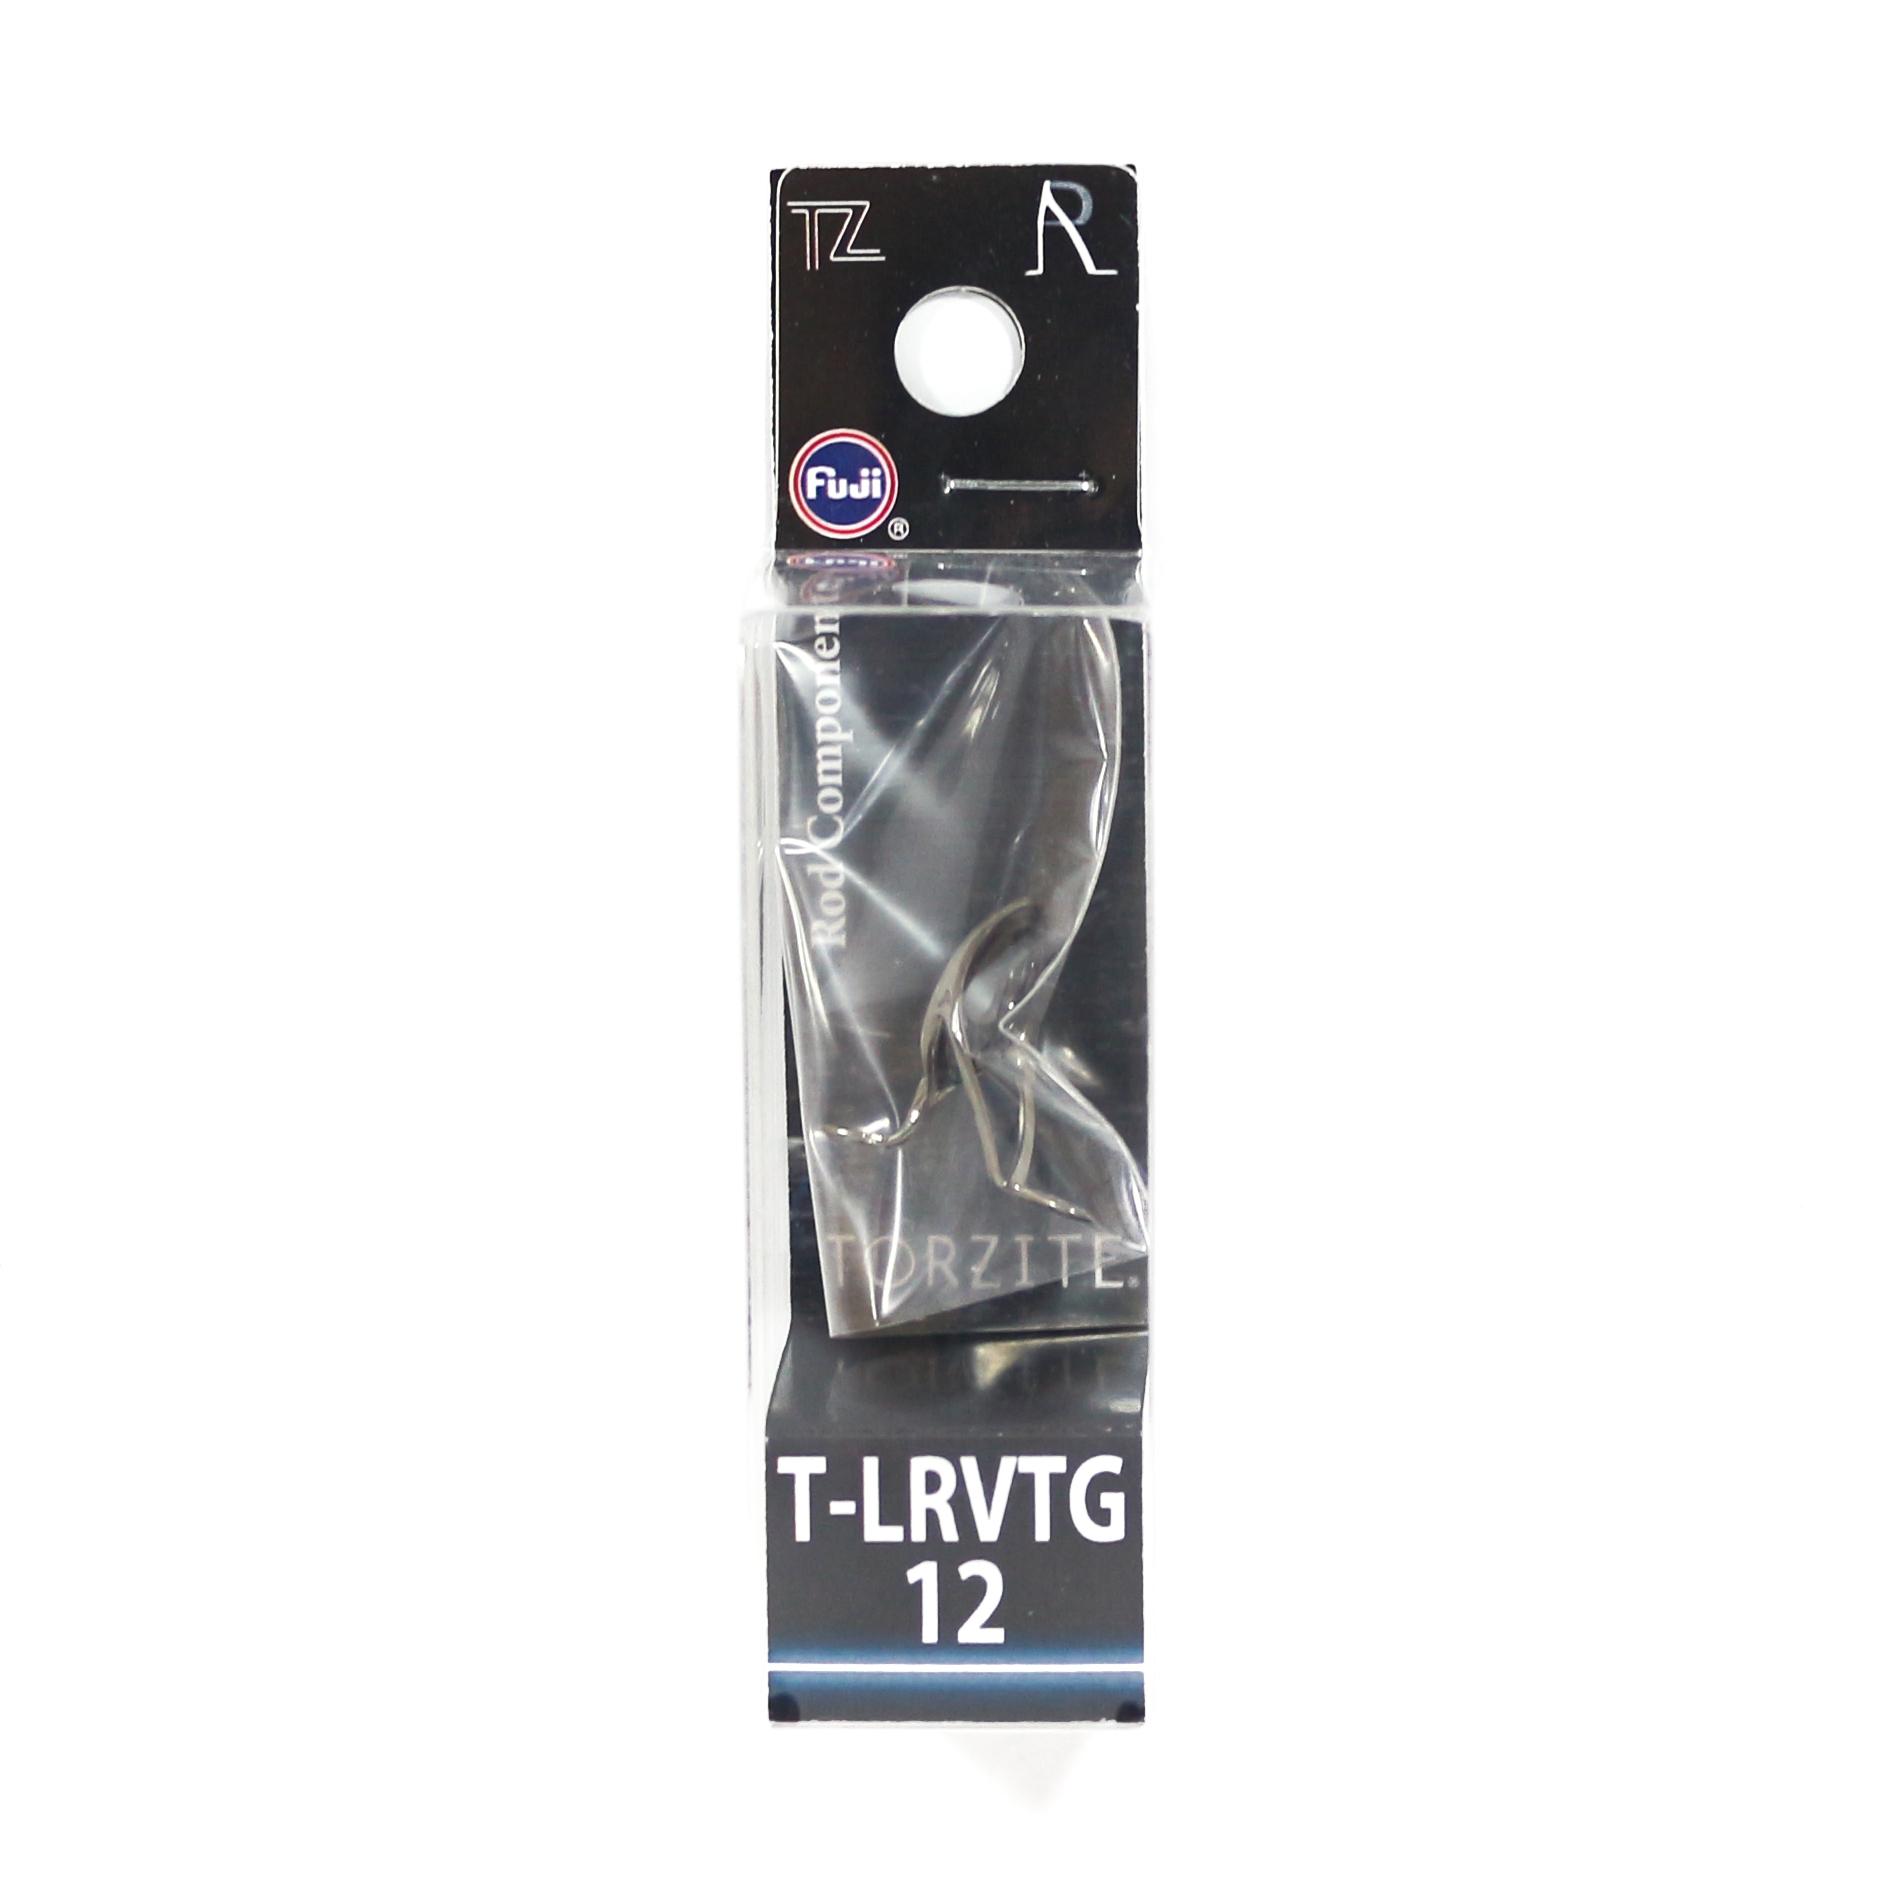 Fuji T-LRVTG Size 12 Rod Guide Titanium Frame SIC x 1 piece (8409)